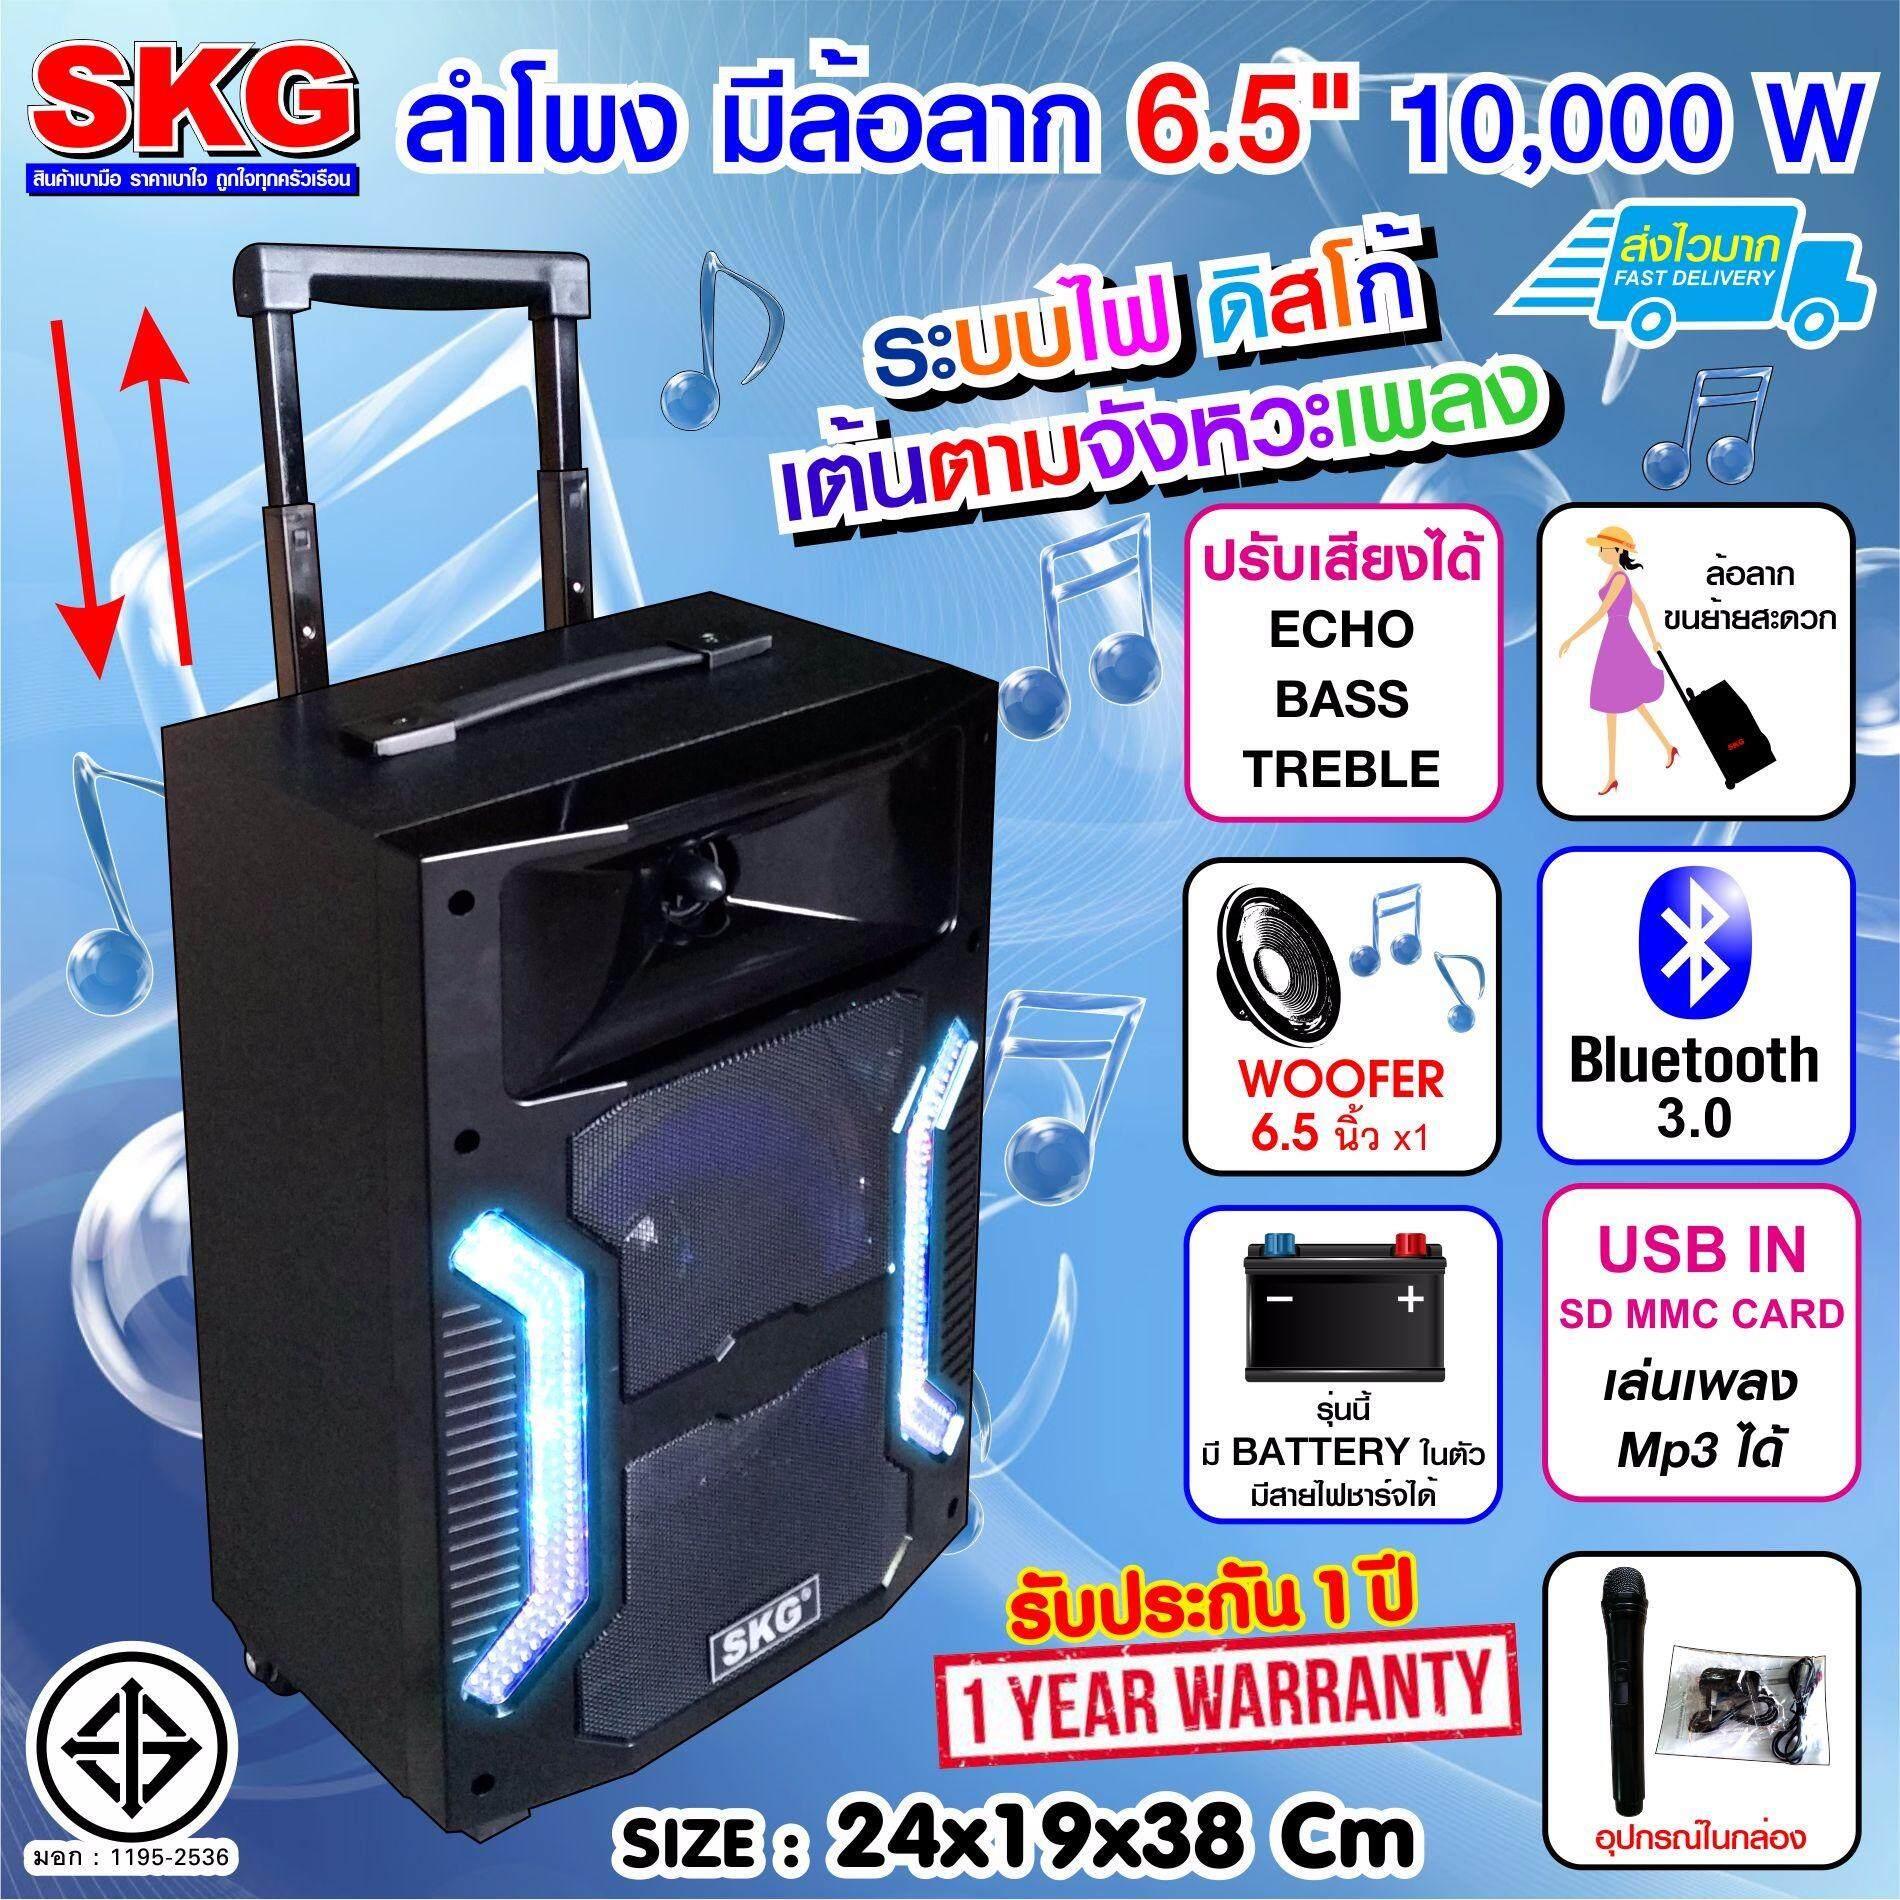 SKG ลำโพง 6.5 นิ้ว 10,000 W แบบมีล้อลาก รุ่น AV-5801 (สีดำ)